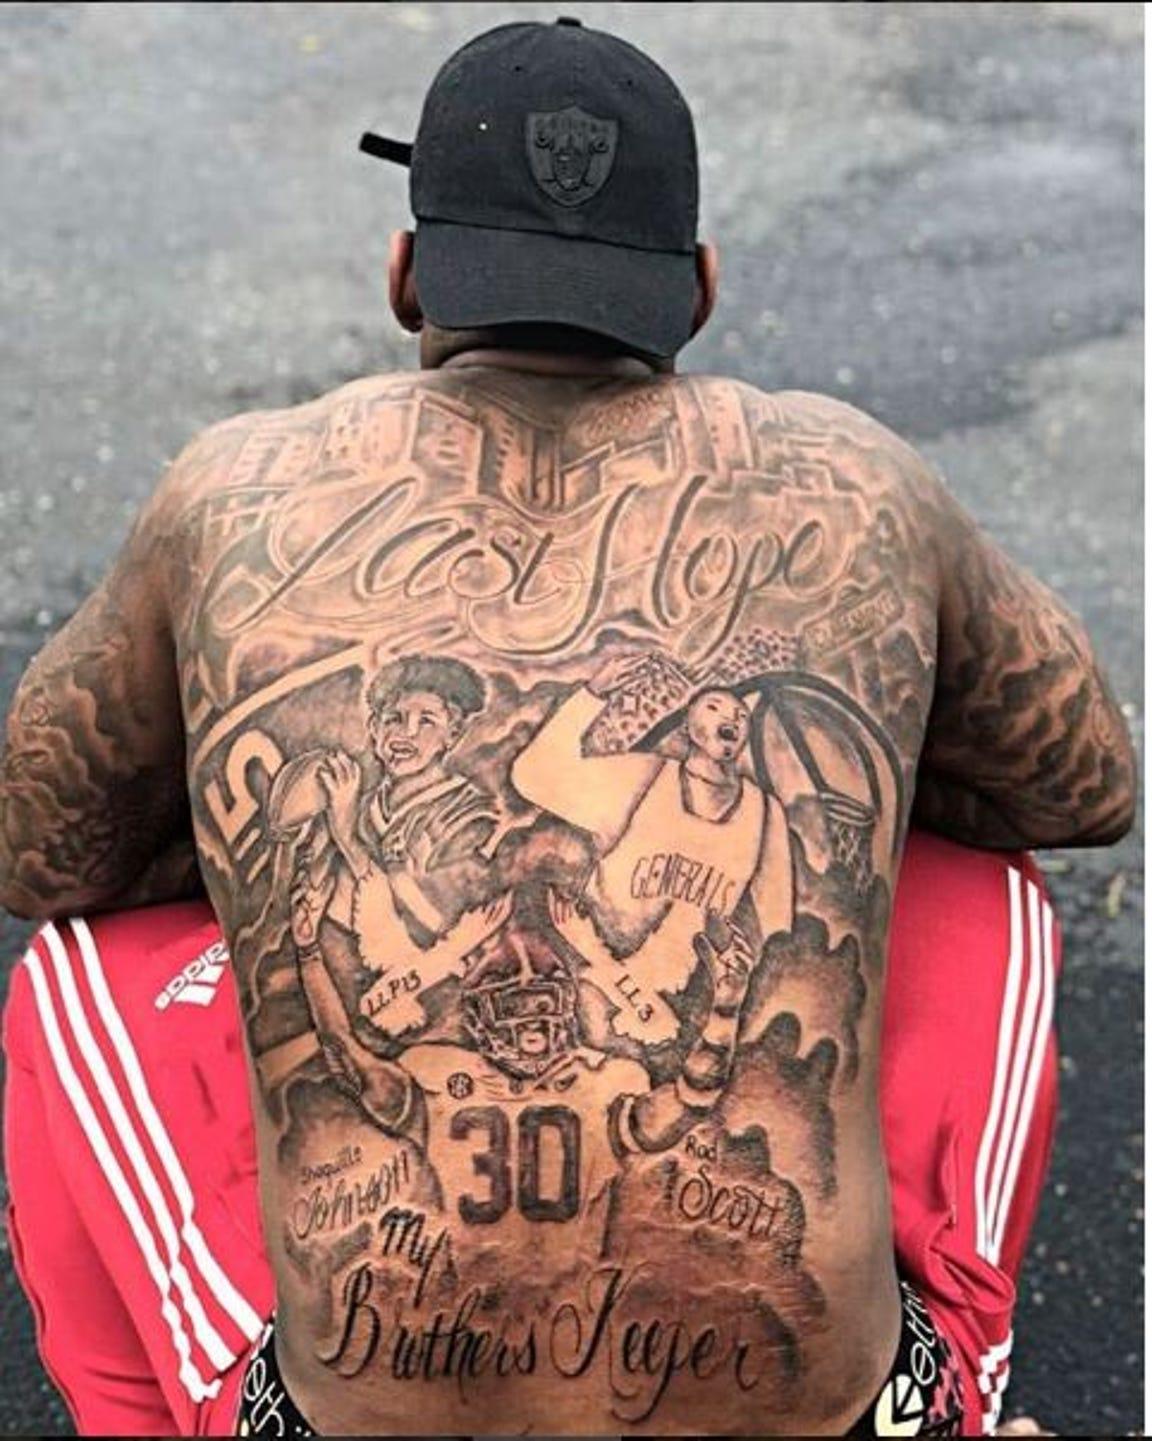 Tattoo artist Michael Jordan drew the tattoos on Mack Wilson's back in tribute to fallen loved ones Rod Scott and Shaquille Johnson.